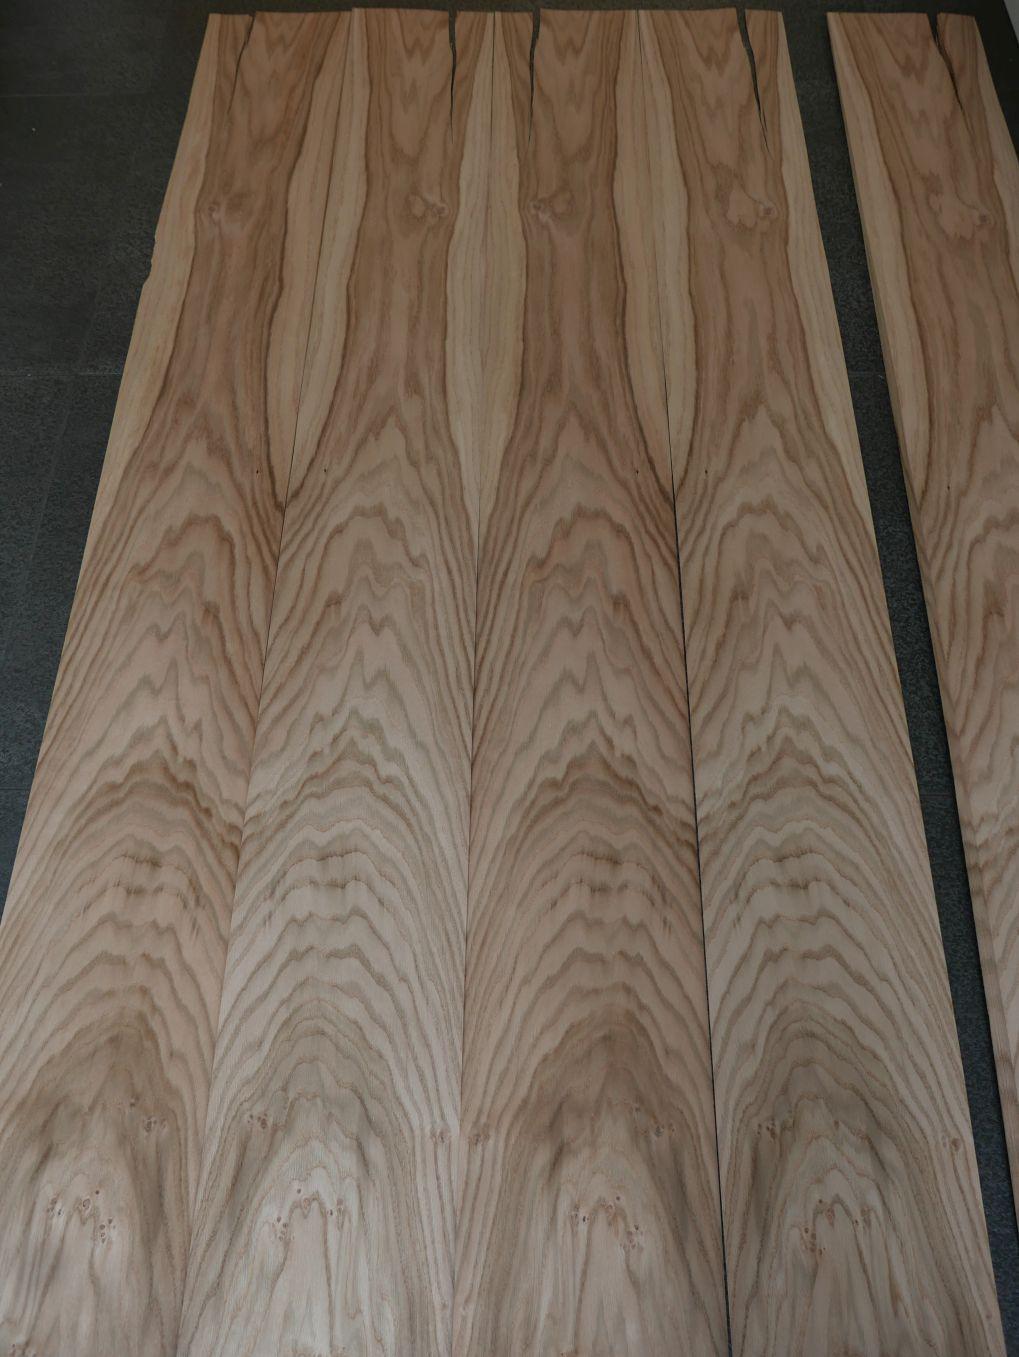 A0177-4 Eiken 24,5-28×155-196cm 30st